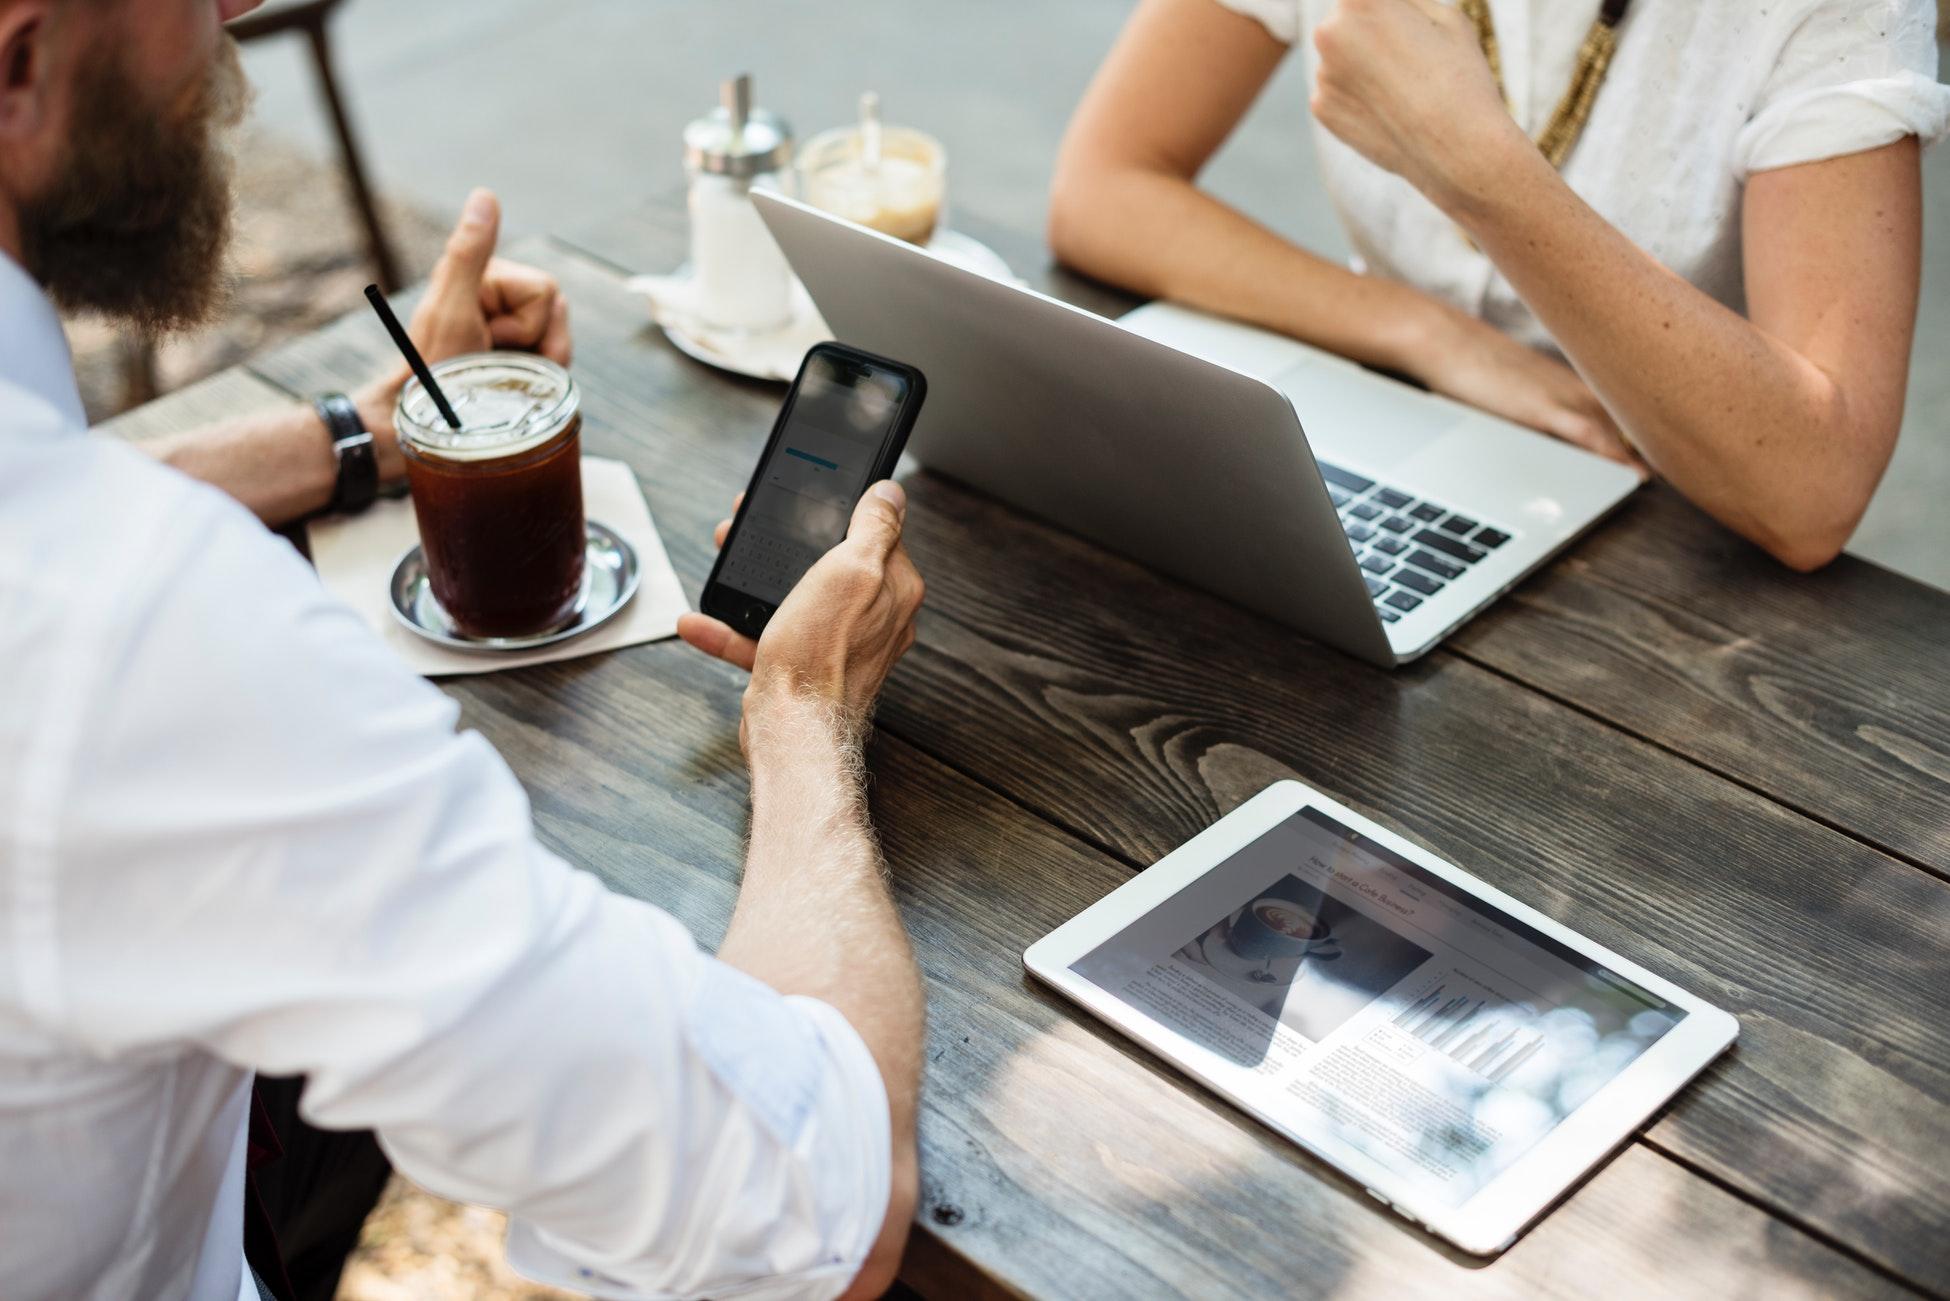 Collaboration using Microsoft SharePoint